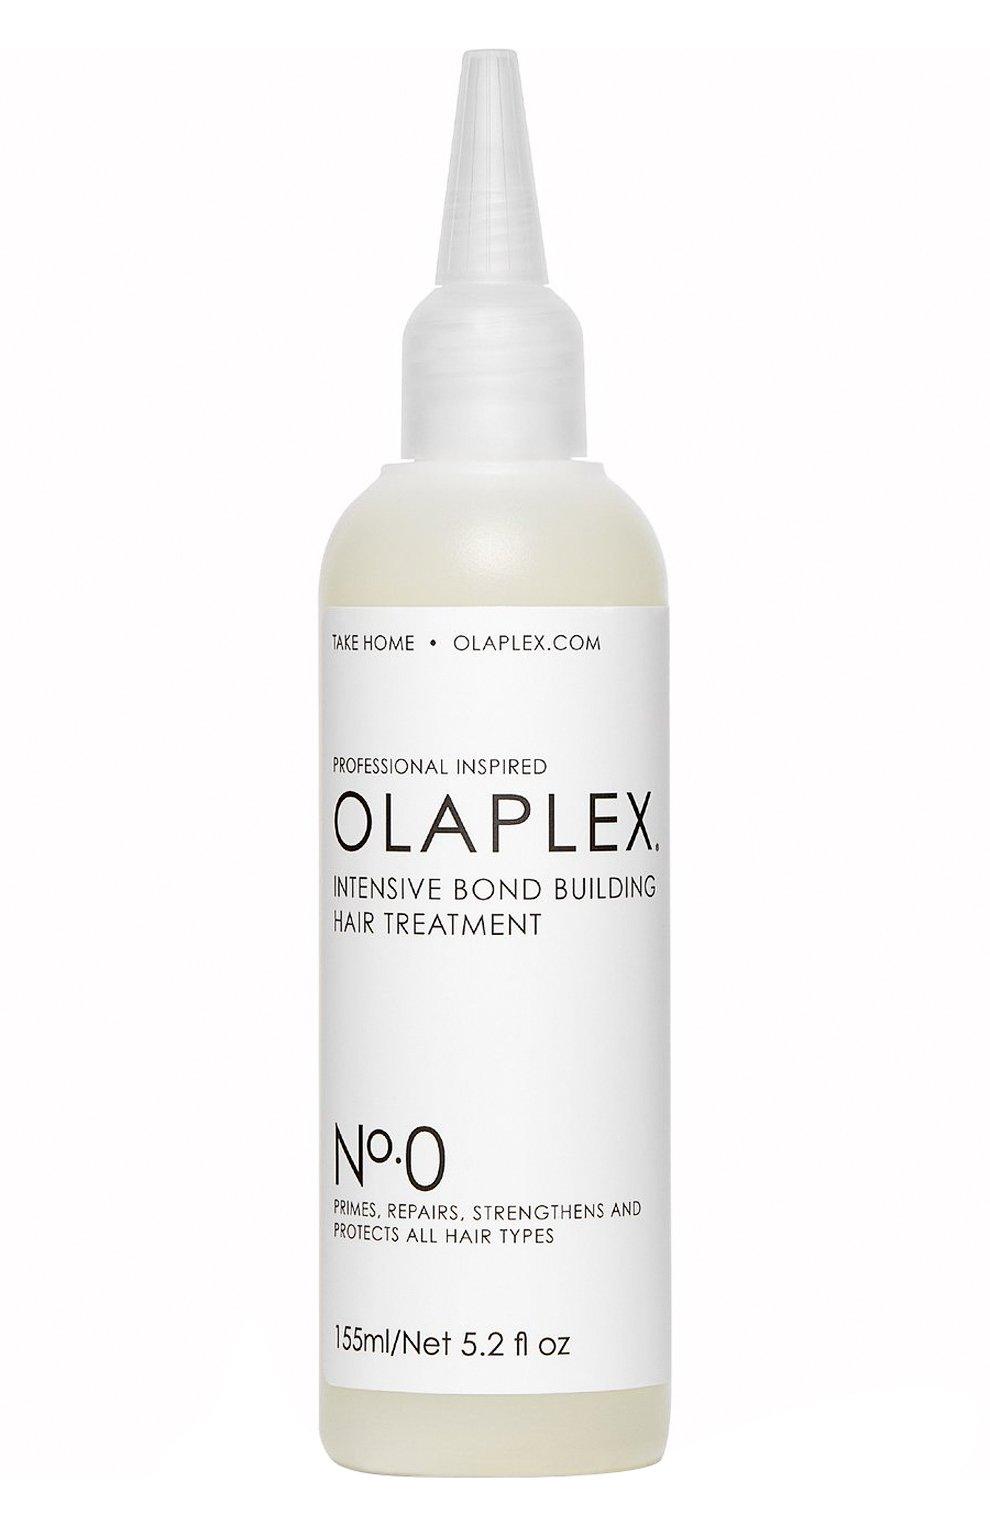 Интенсивный уход-праймер olaplex no. 0 bond building hair treatment (155ml) OLAPLEX бесцветного цвета, арт. 896364002879 | Фото 1